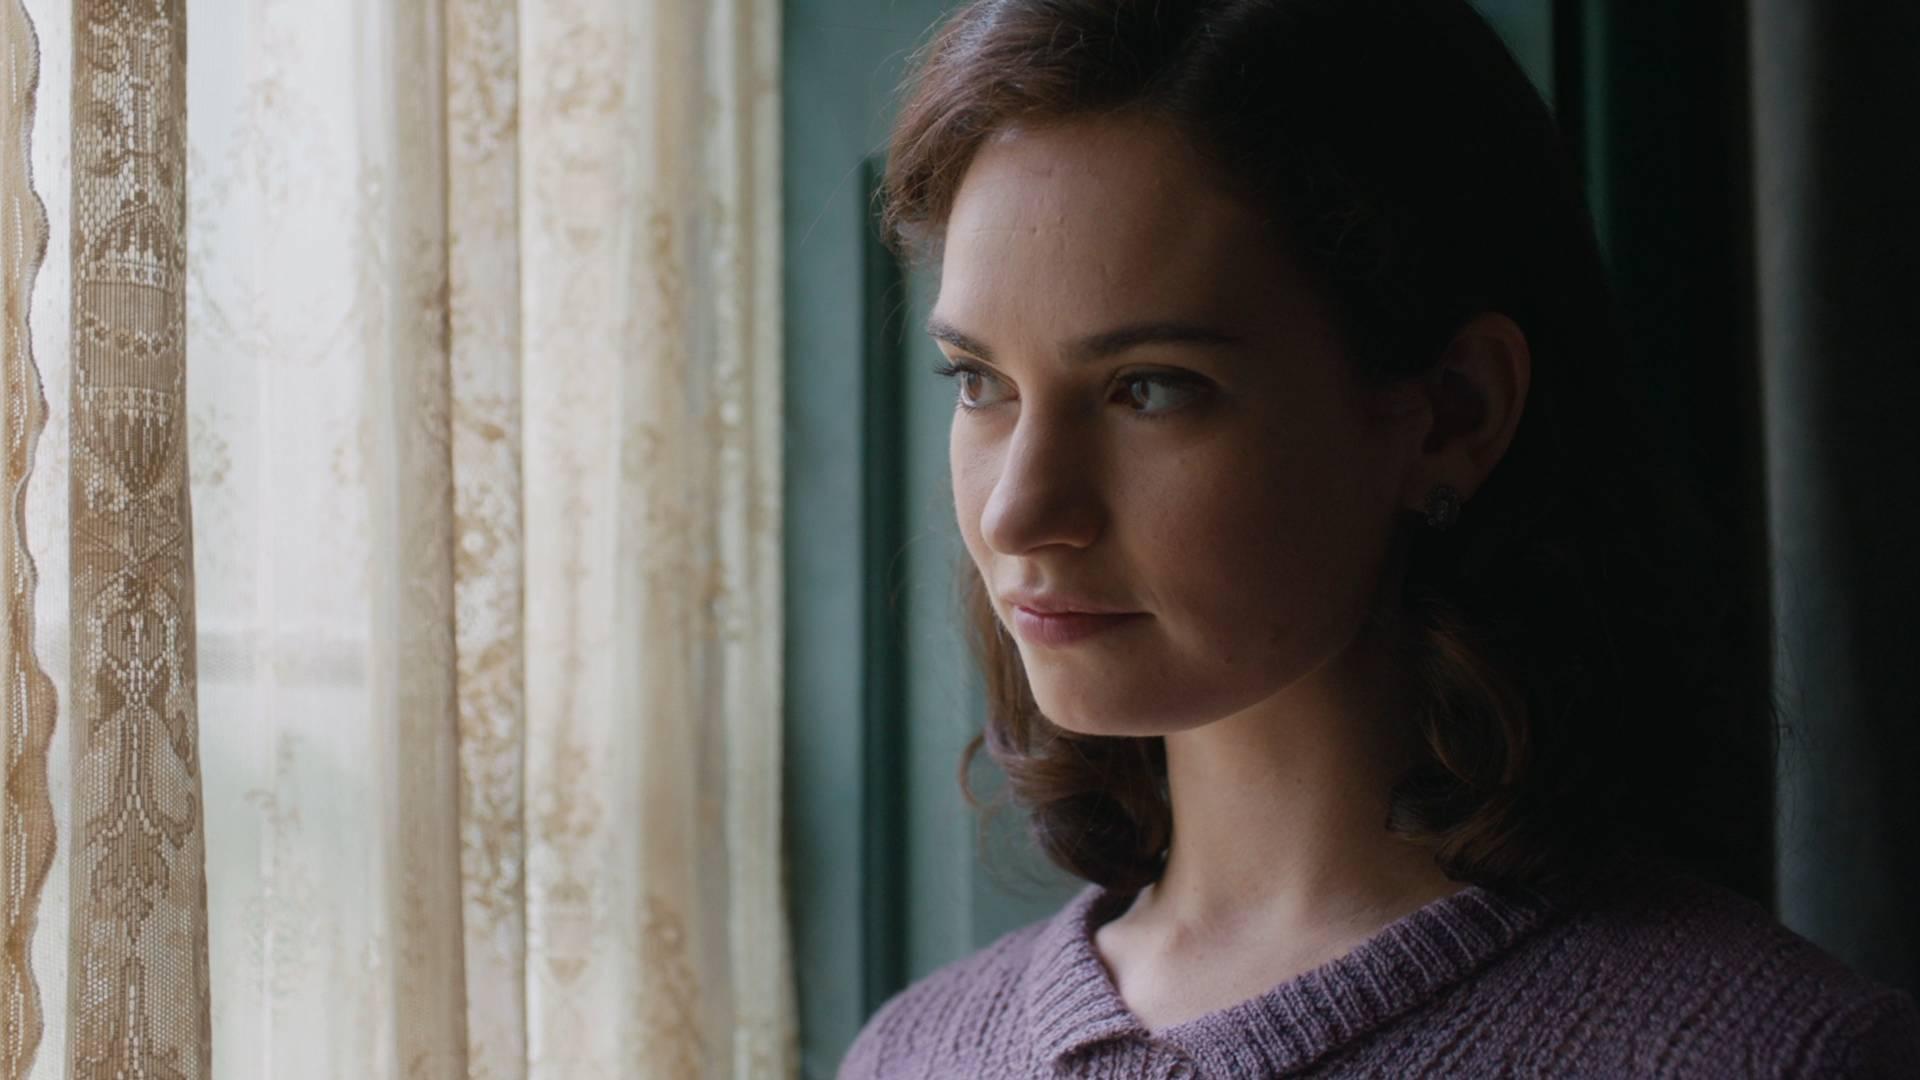 Vue | Cinema Listings & Latest Movies | Book Film Tickets